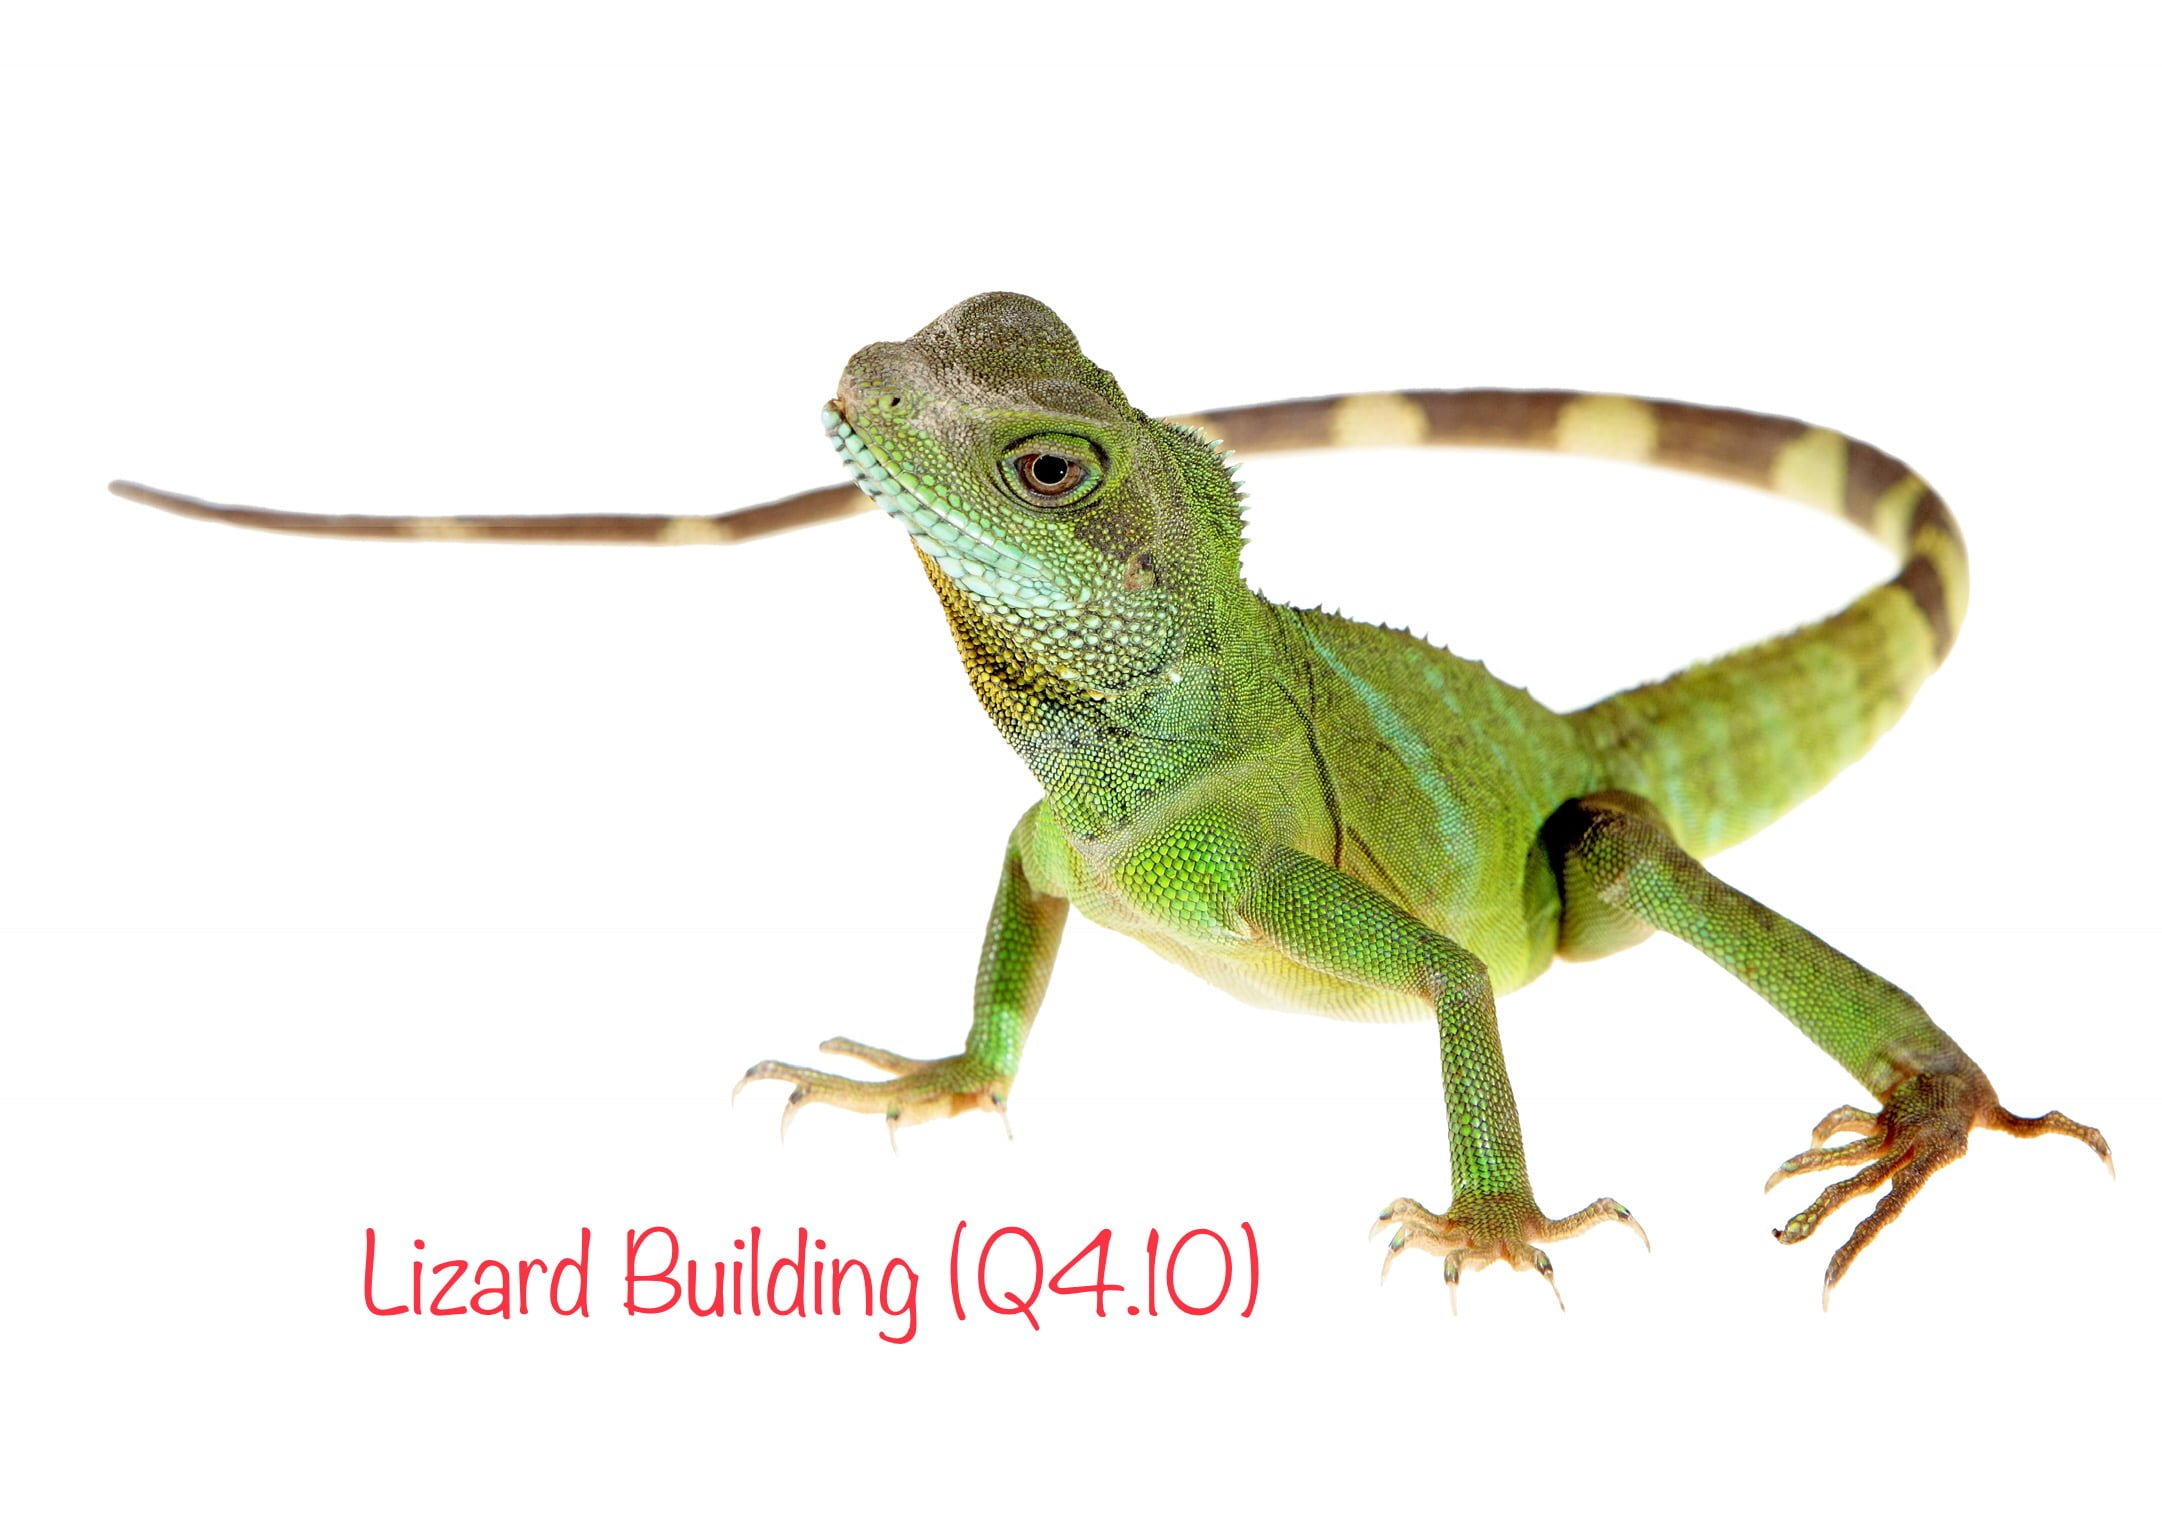 LIZARD BUILDING (Q4.10)